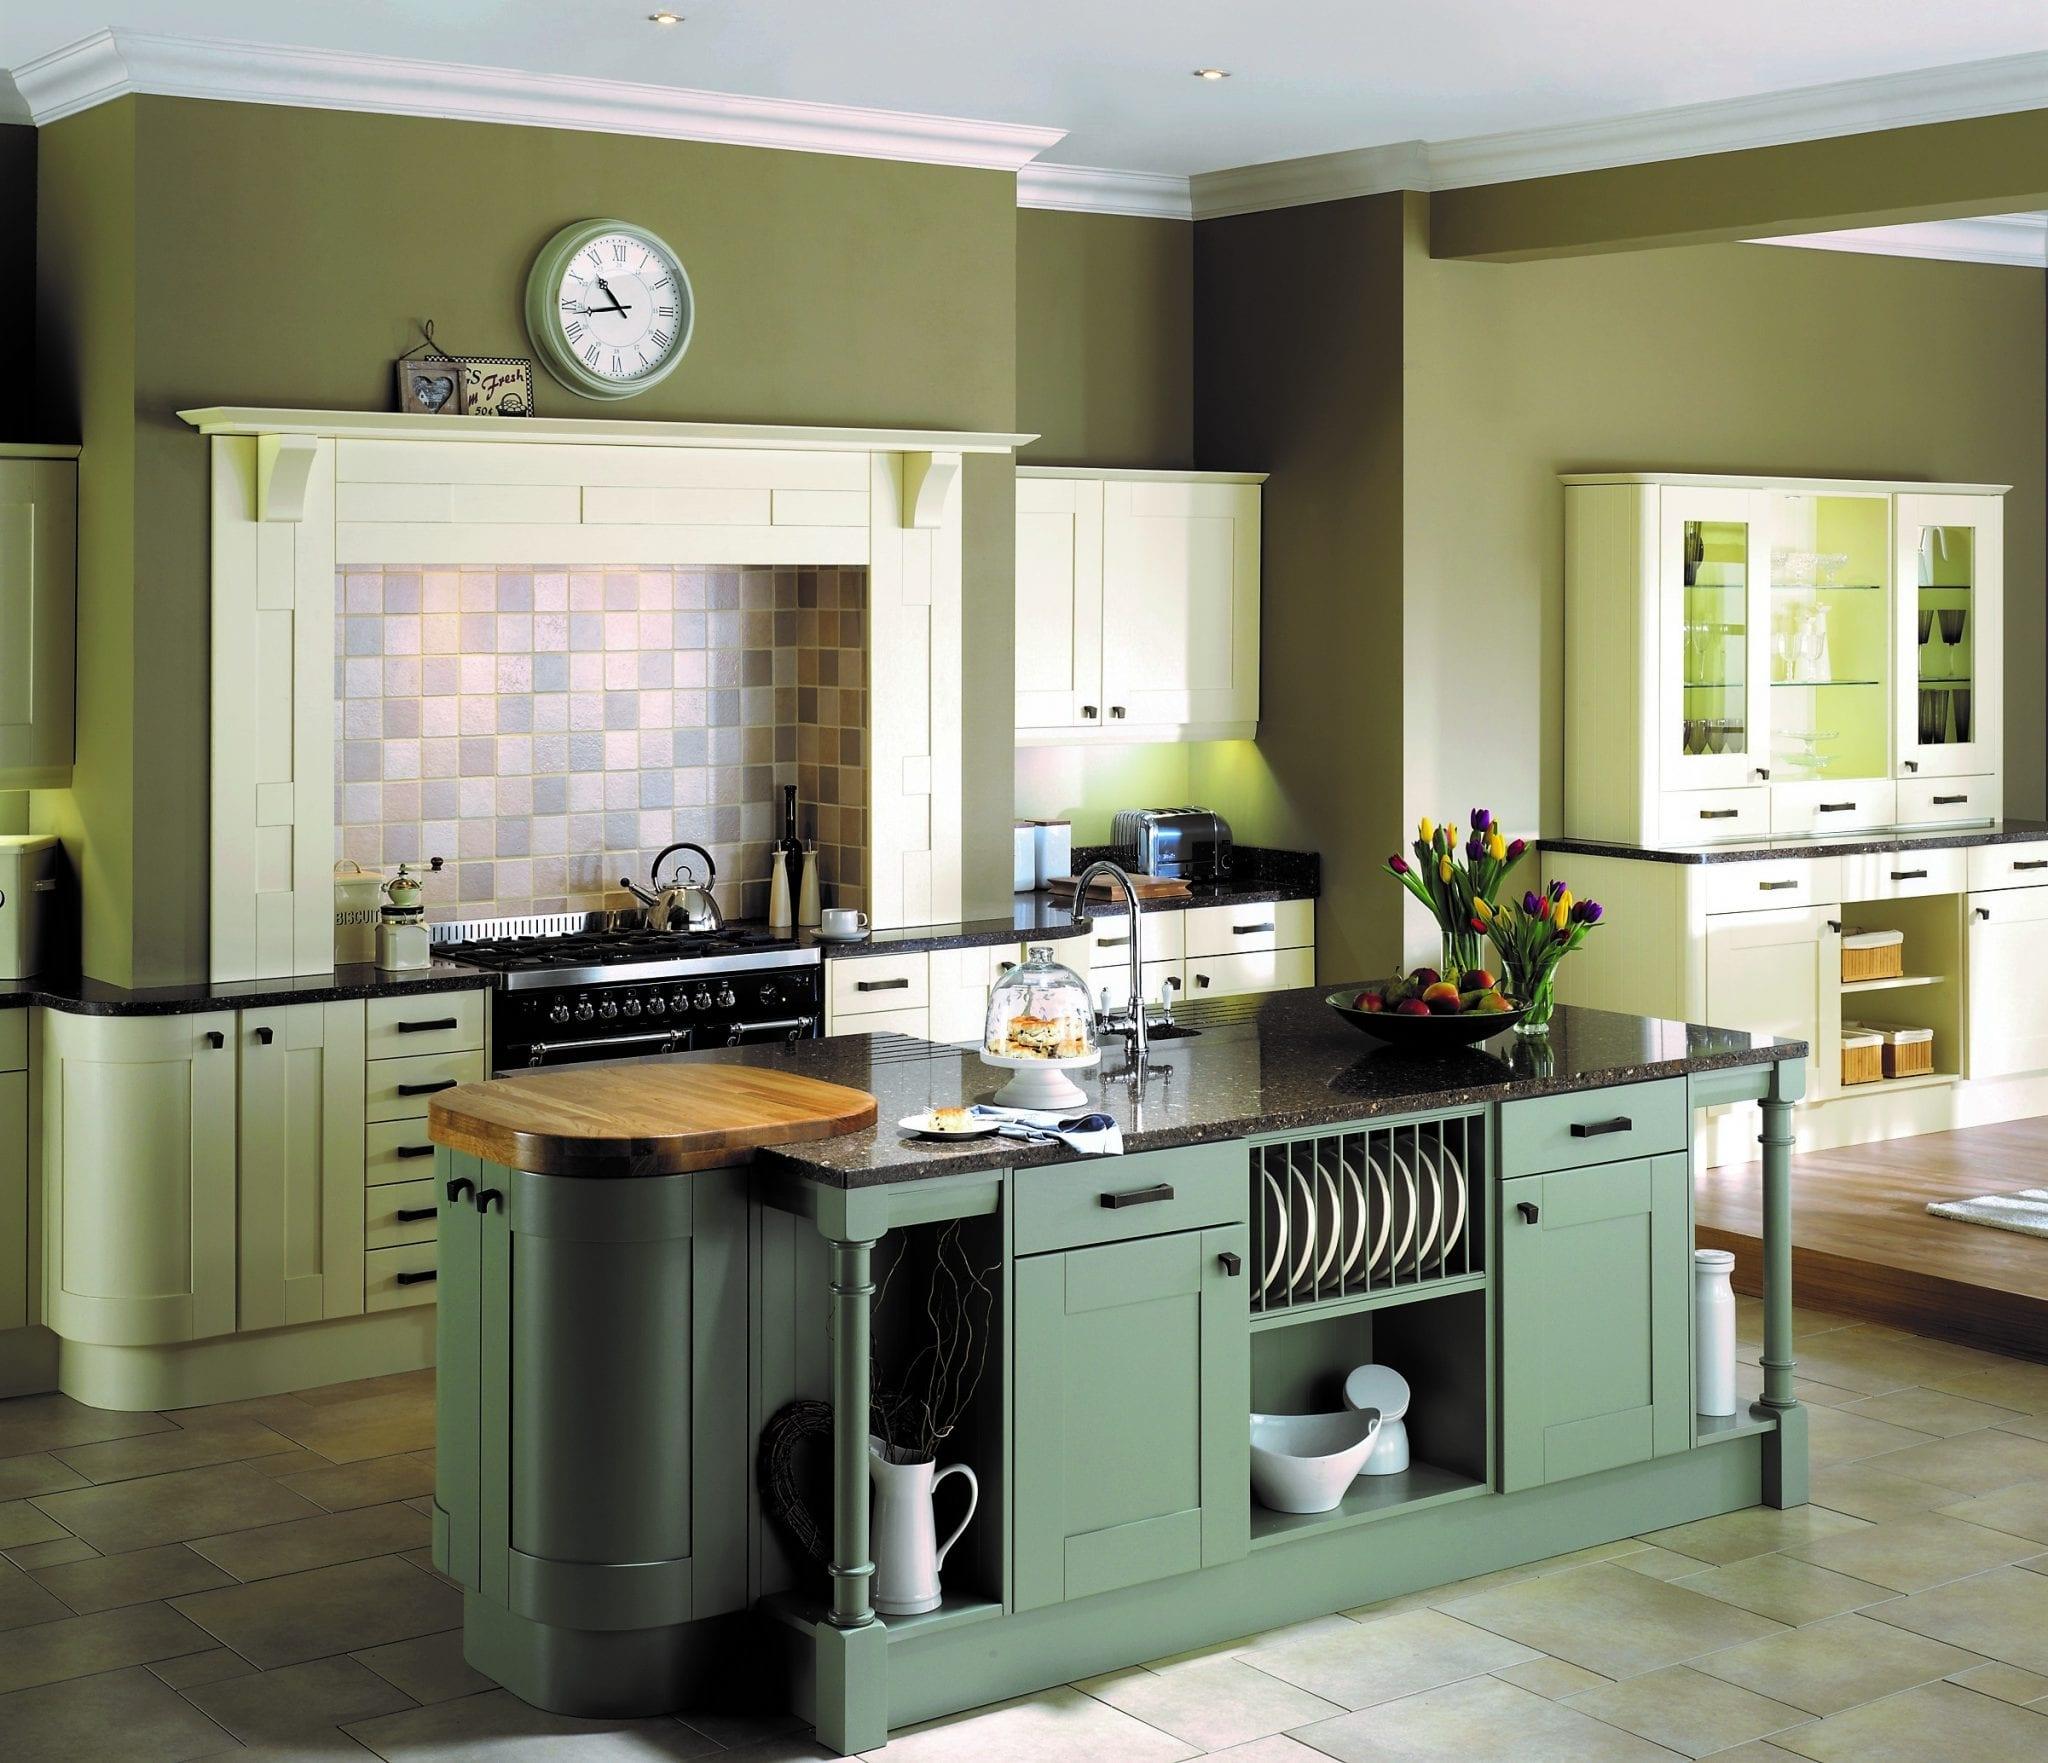 Alchemy style kitchen in Olive Green